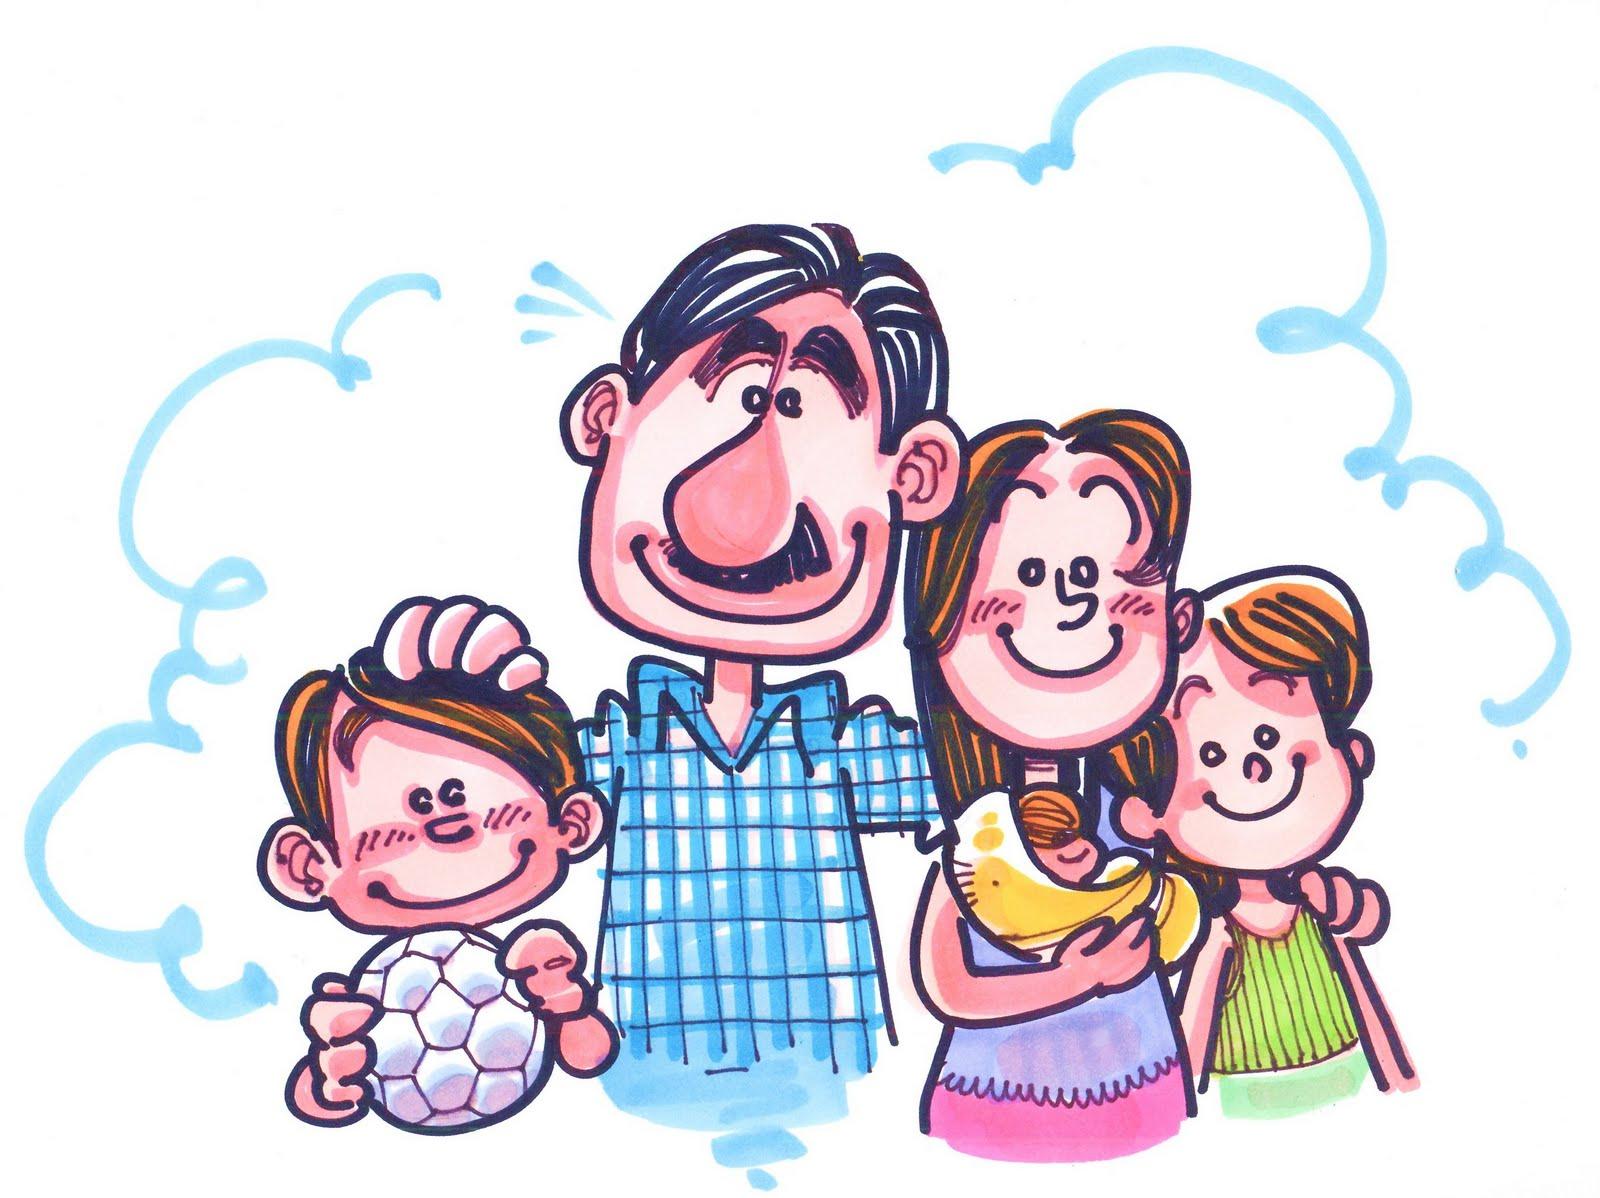 Familia De 4 Personas Dibujos  Bioinformatics RD